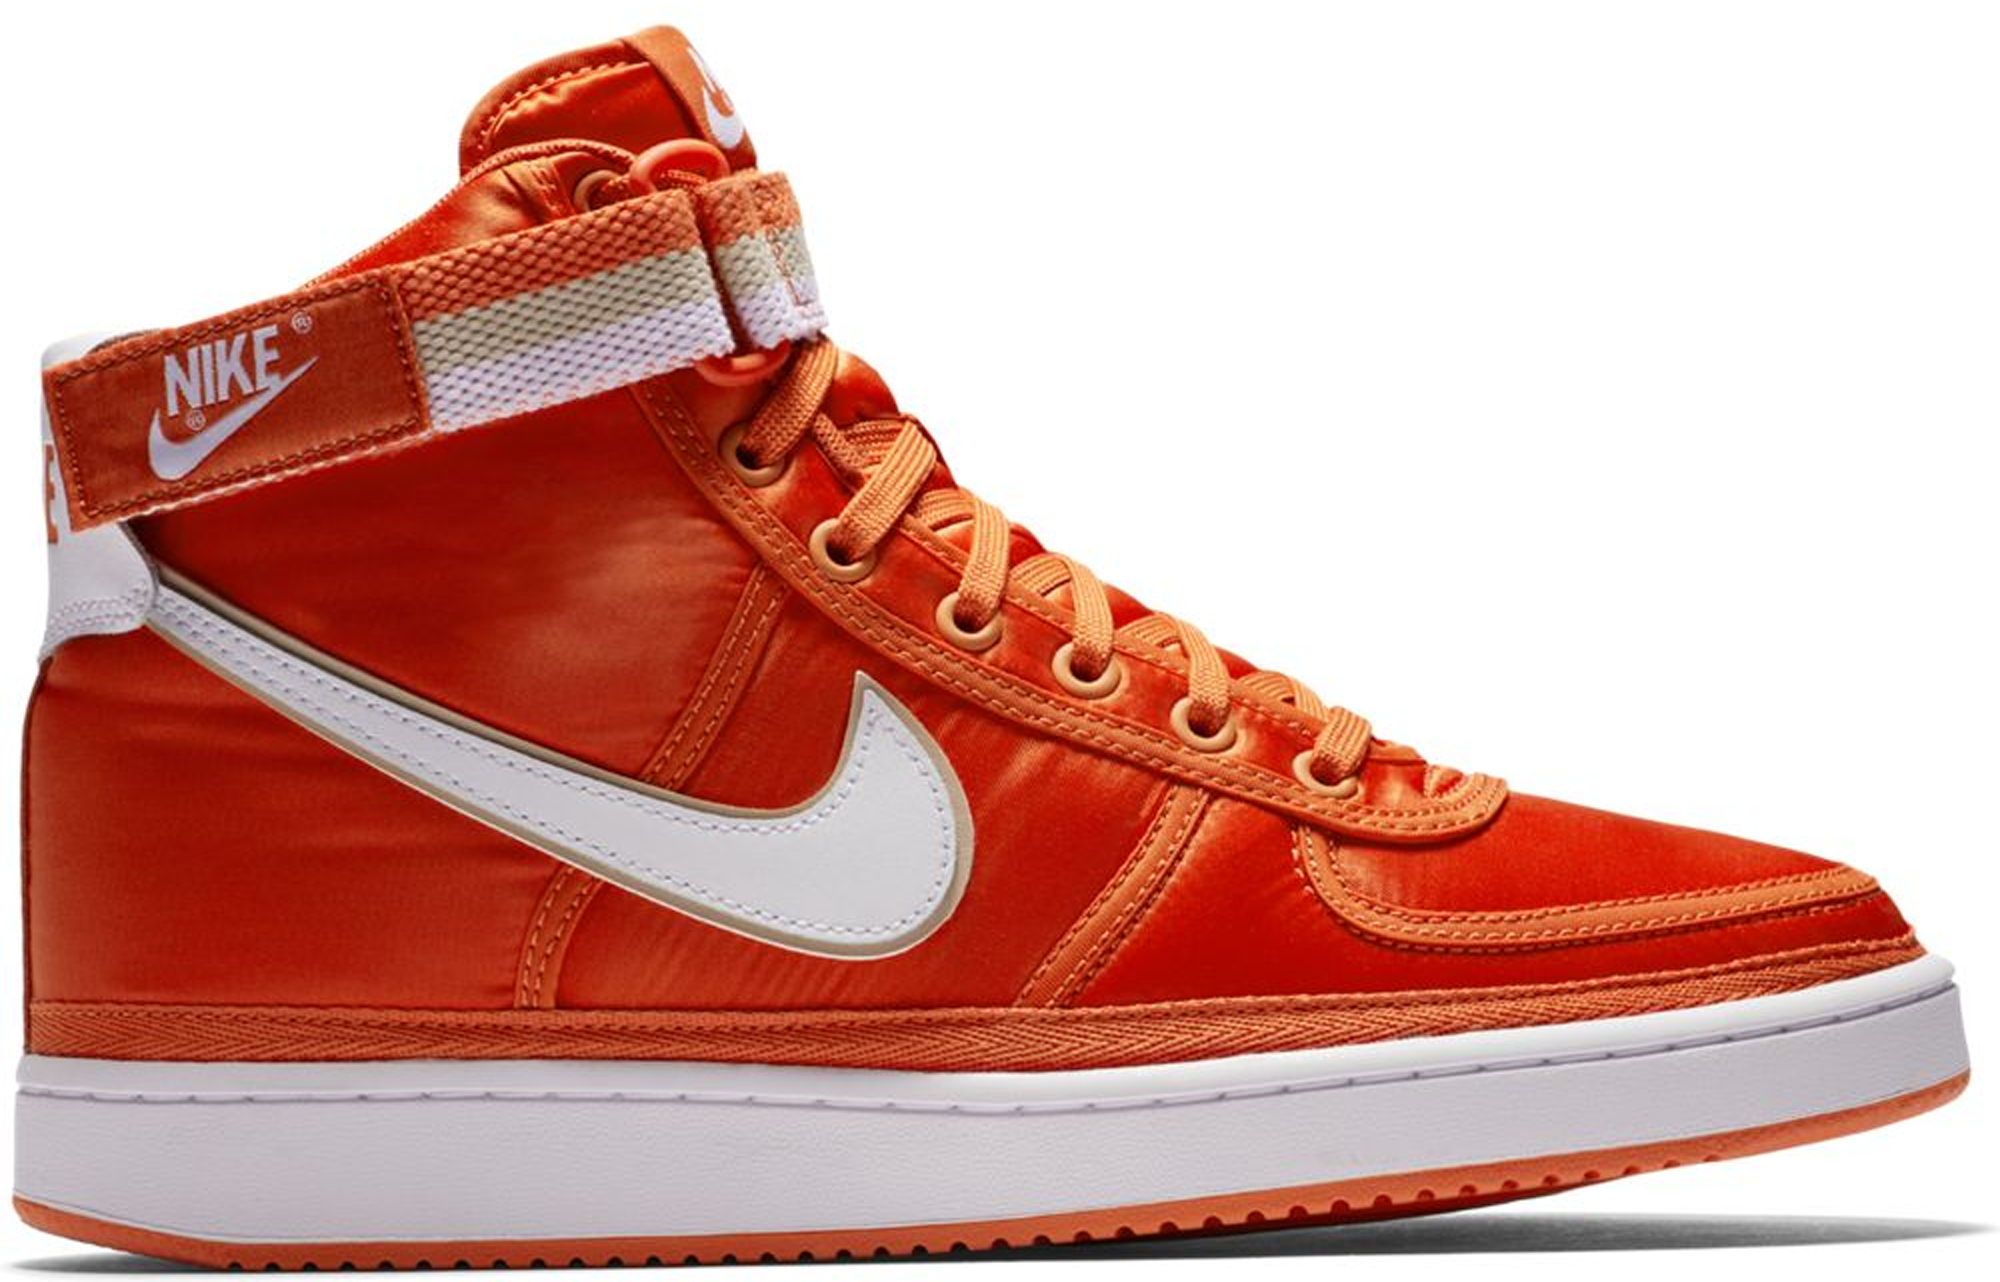 Nike Vandal High Supreme Vintage Coral